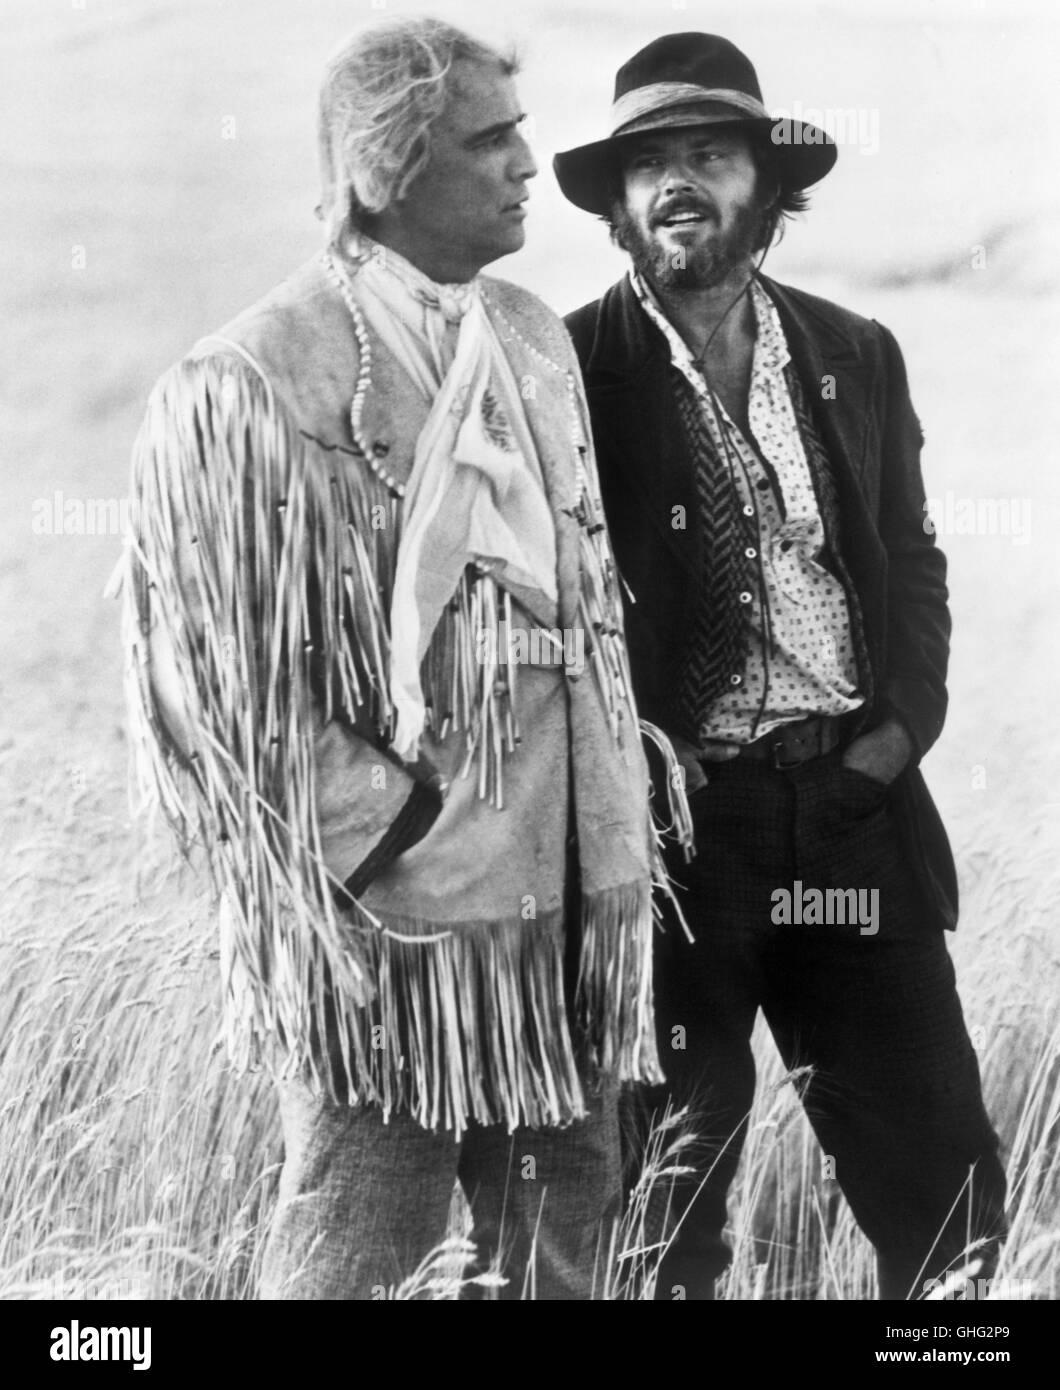 Duell am Missouri - The Missouri Breaks USA 1976 / Arthur Penn Lee Clayton (MARLON BRANDO) is a 'regulator', - Stock Image